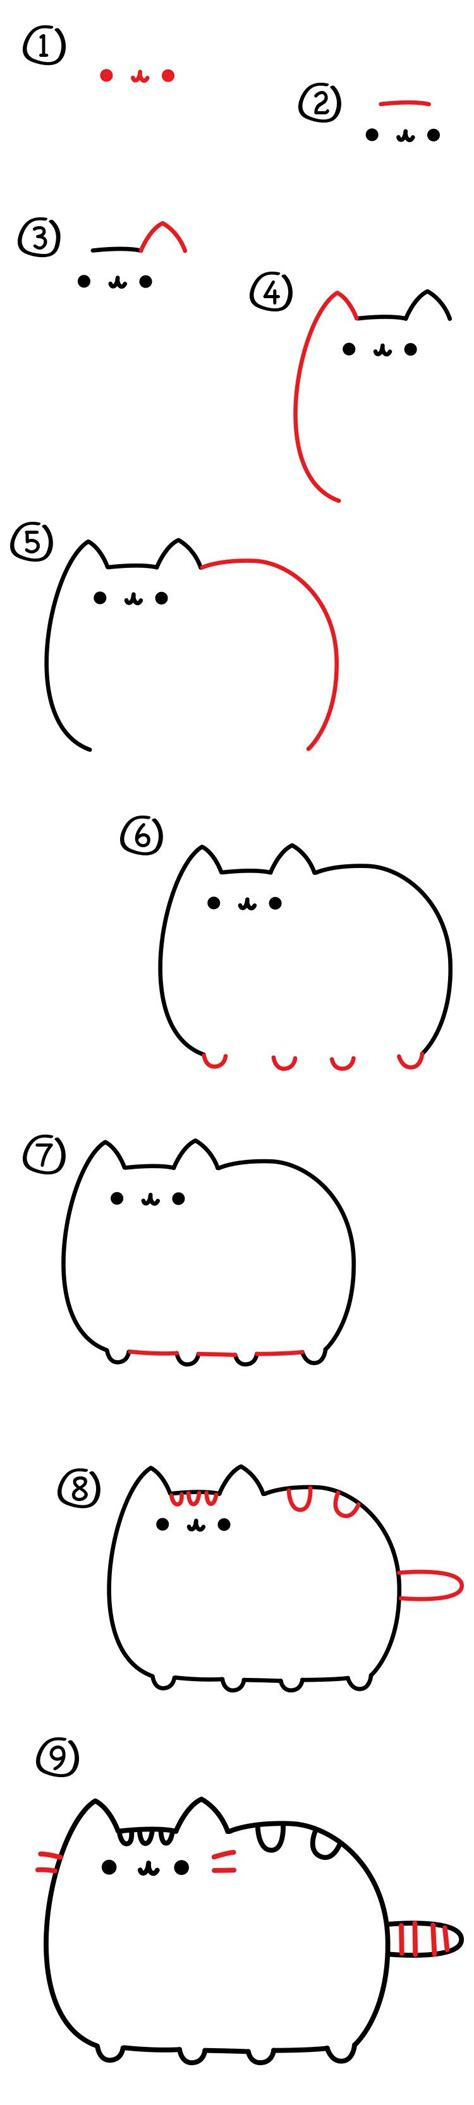 cat easy how to draw the pusheen cat for hub pusheen